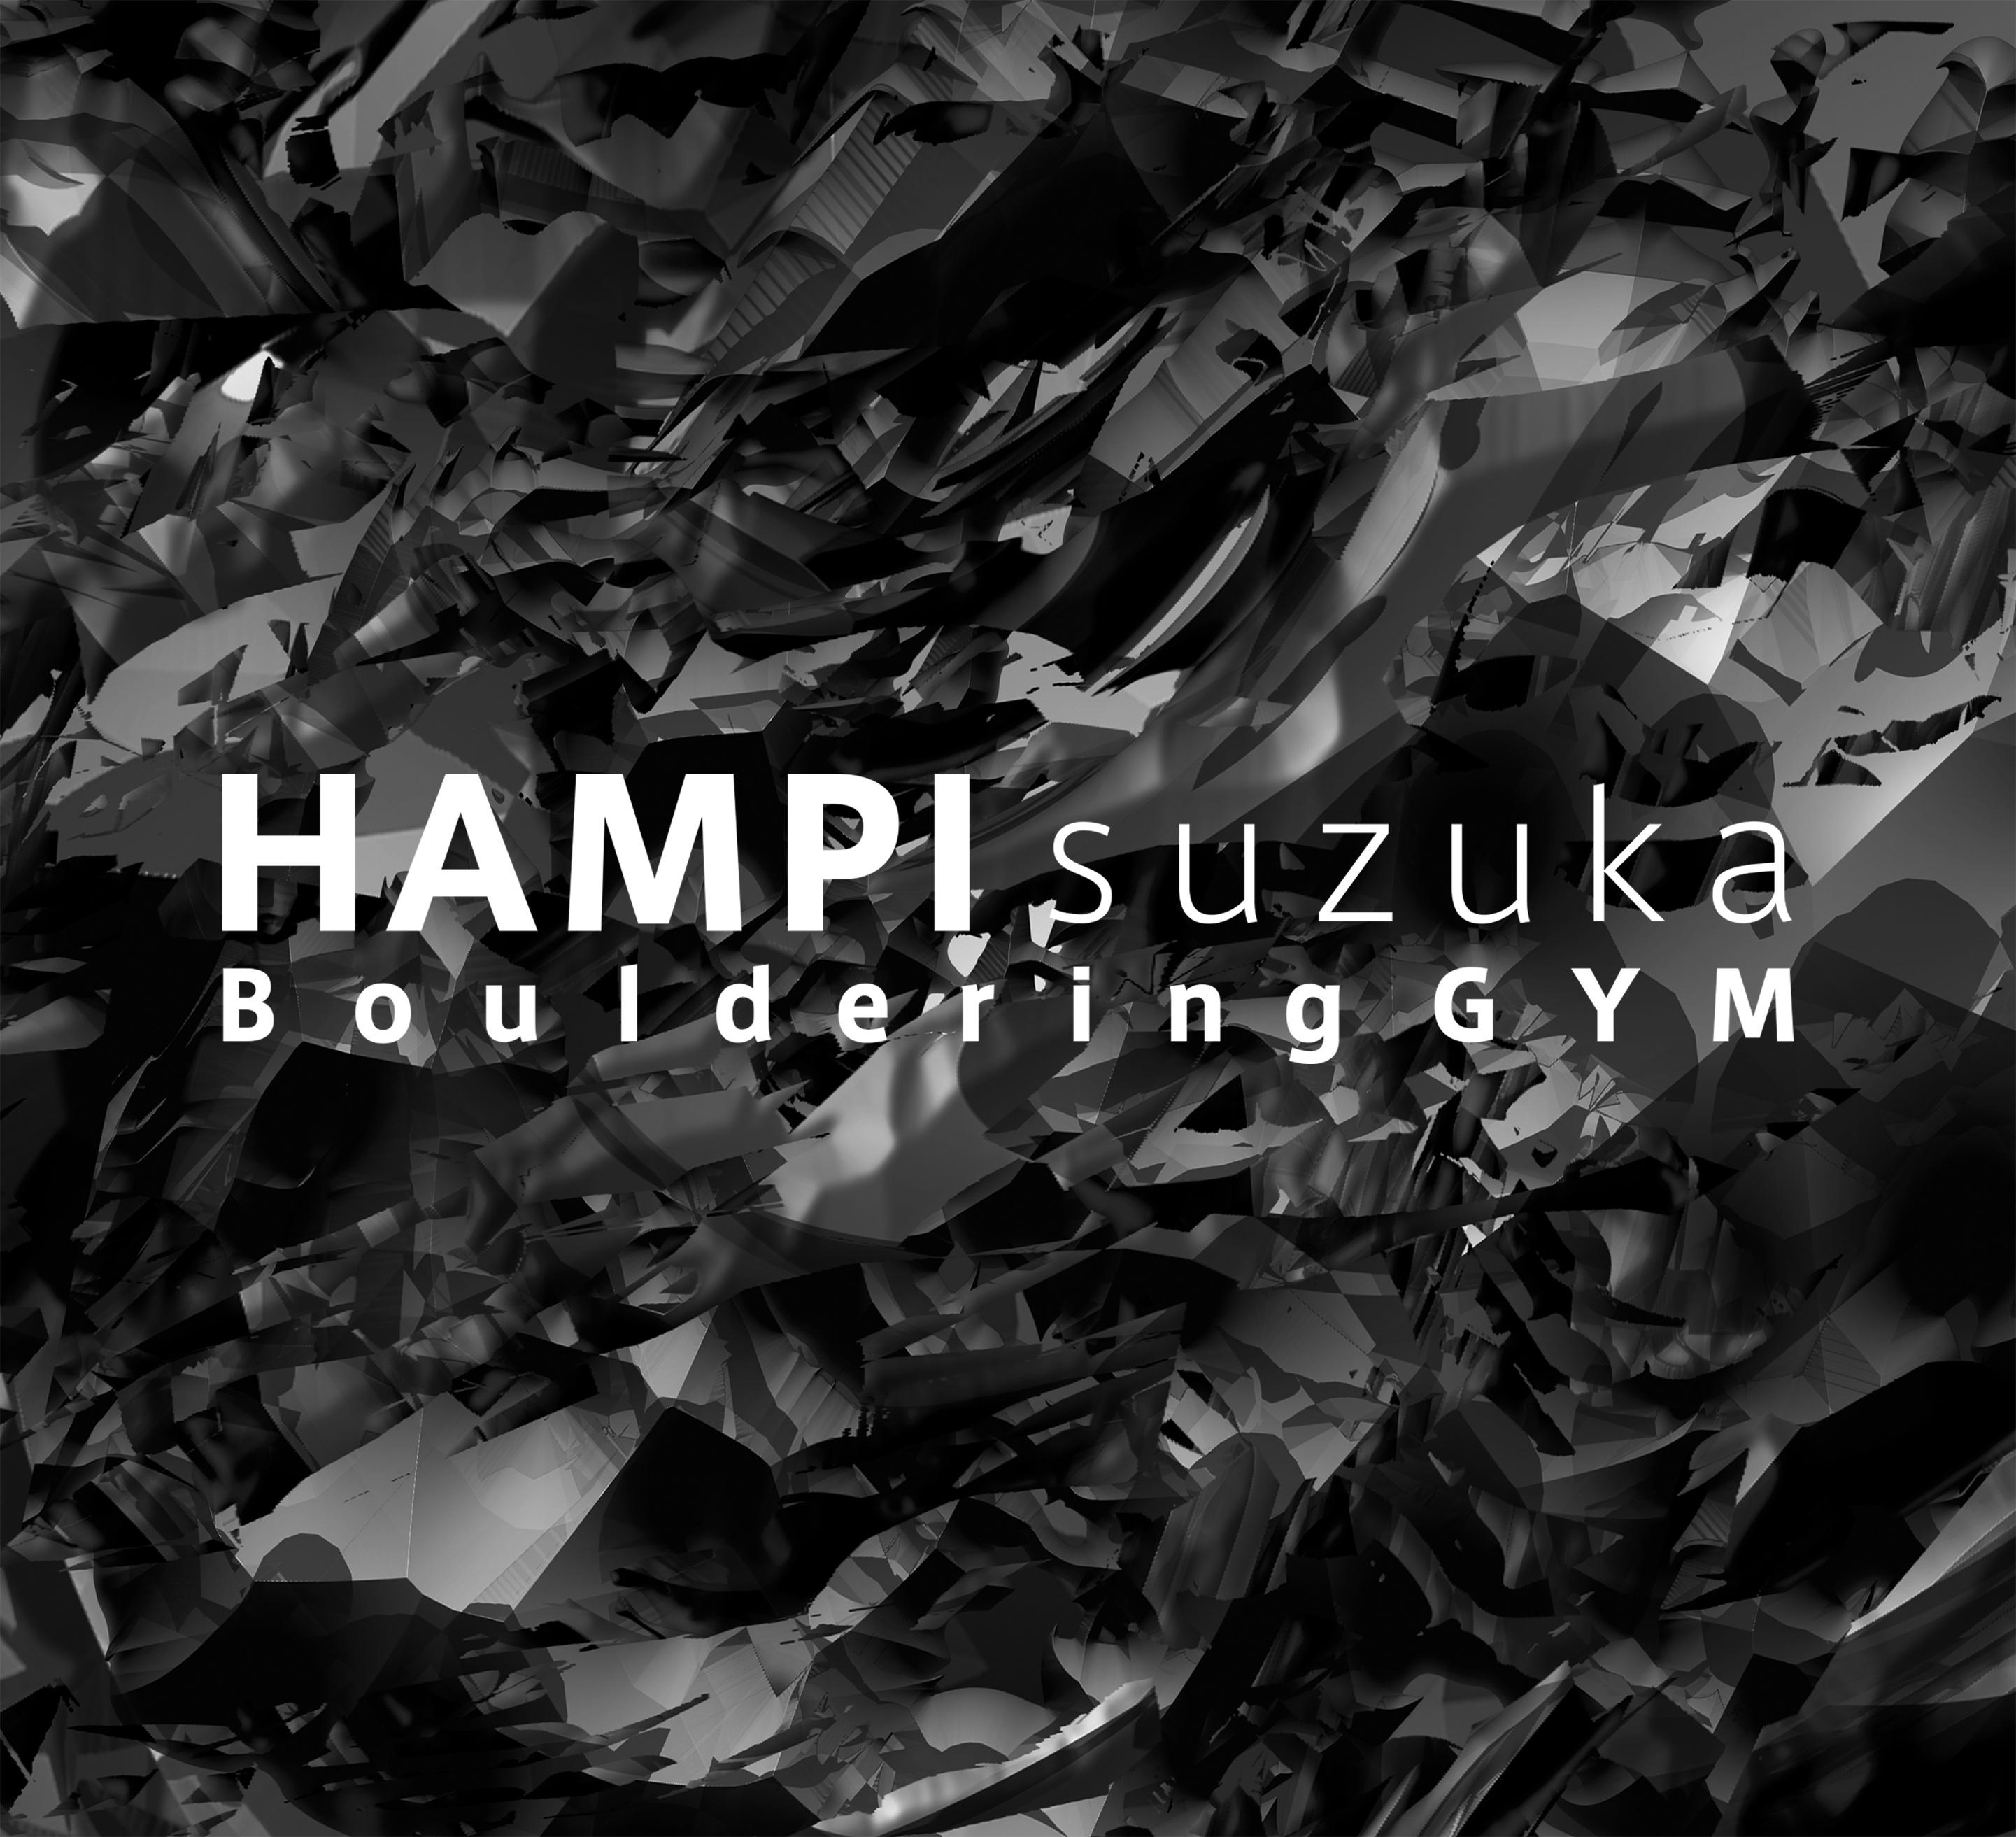 hampi-image-black